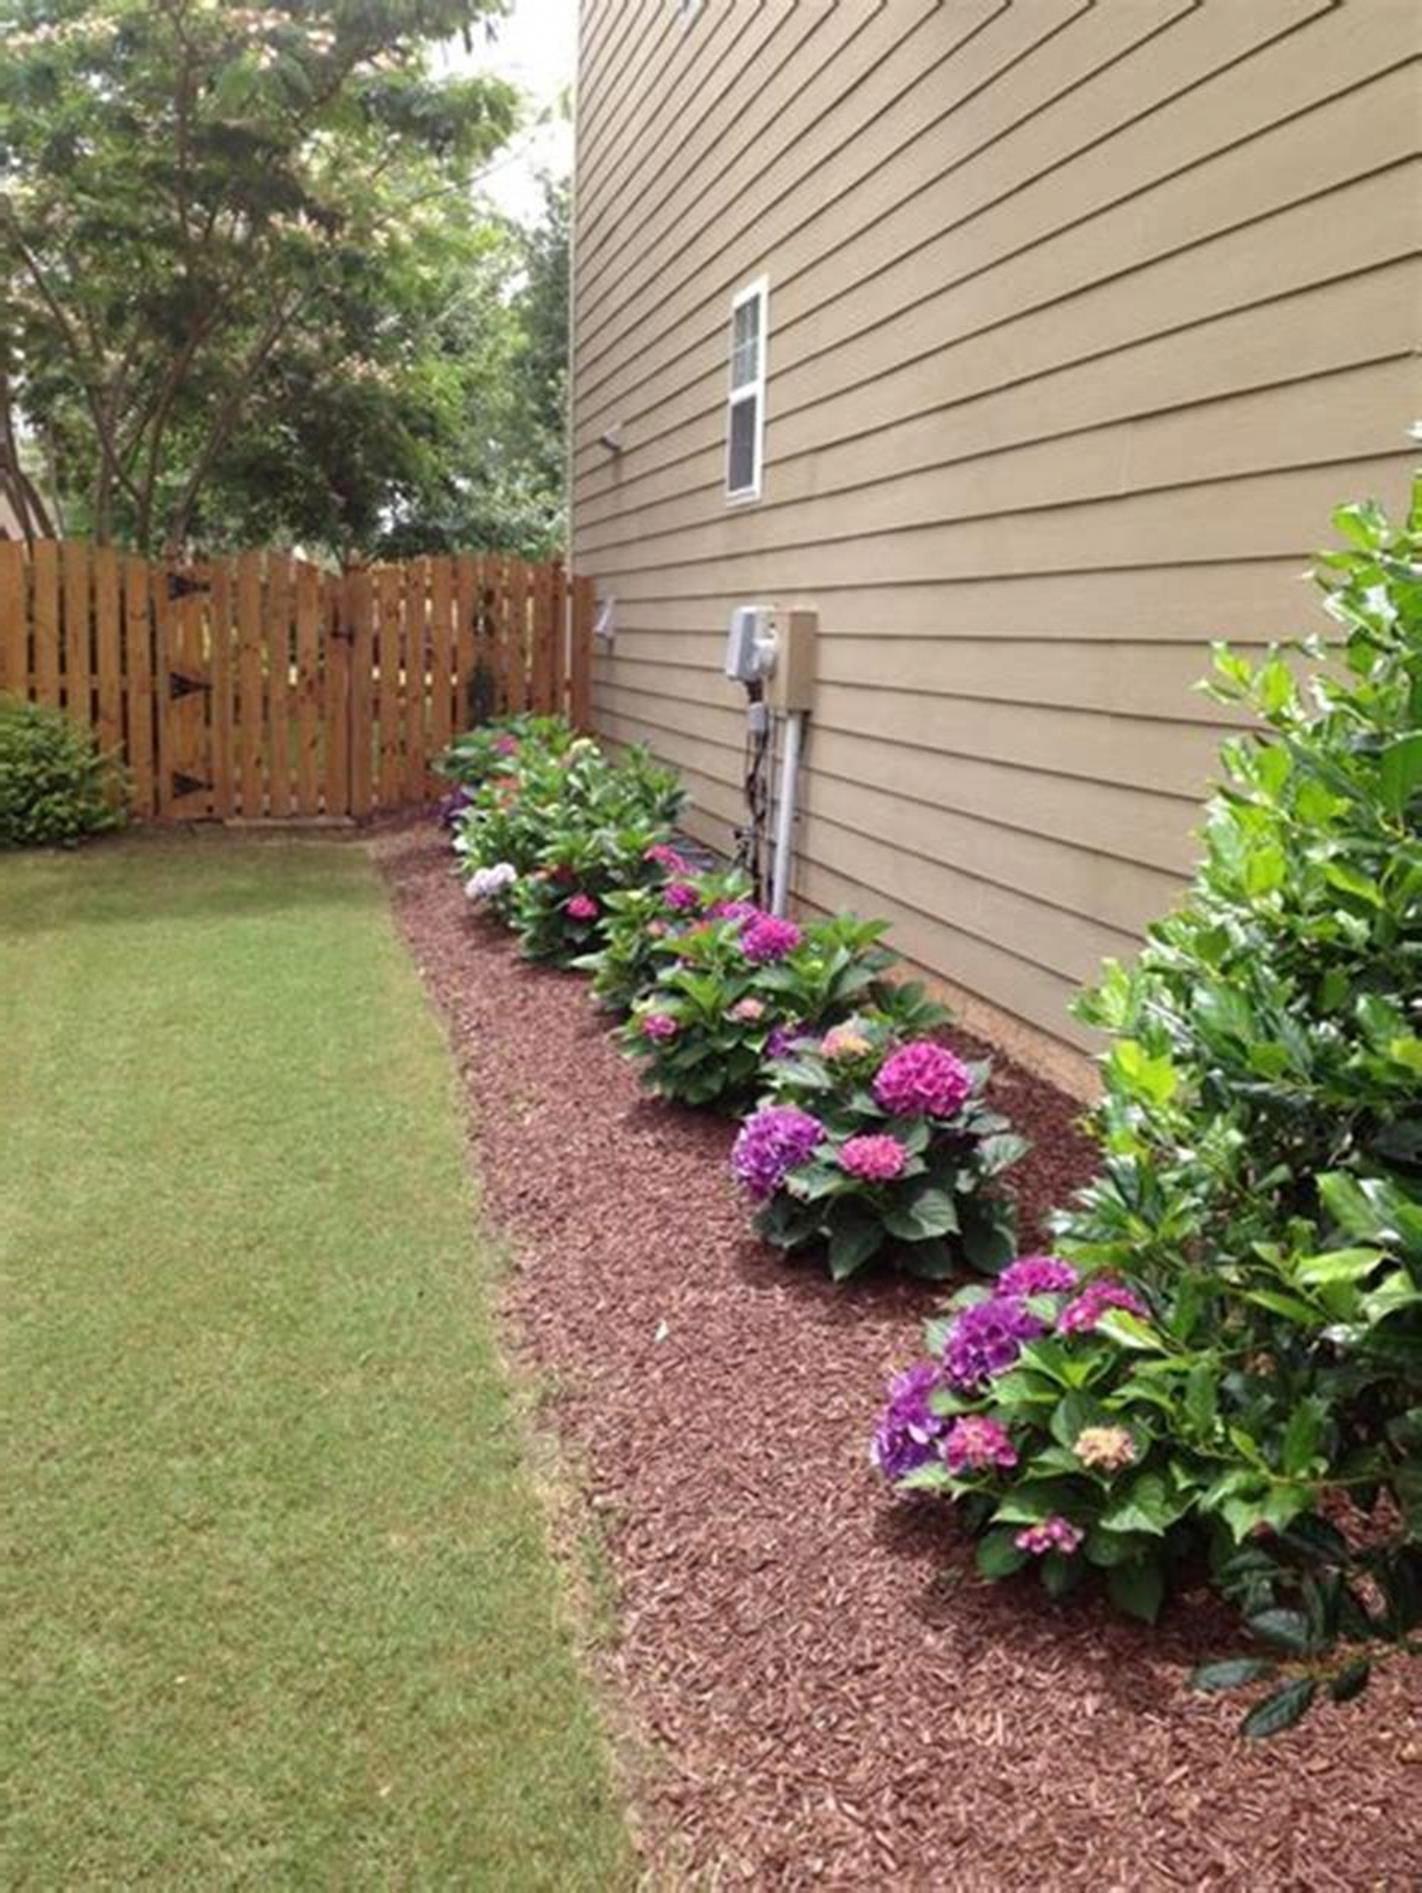 Photo of Rockery Garden Ideas